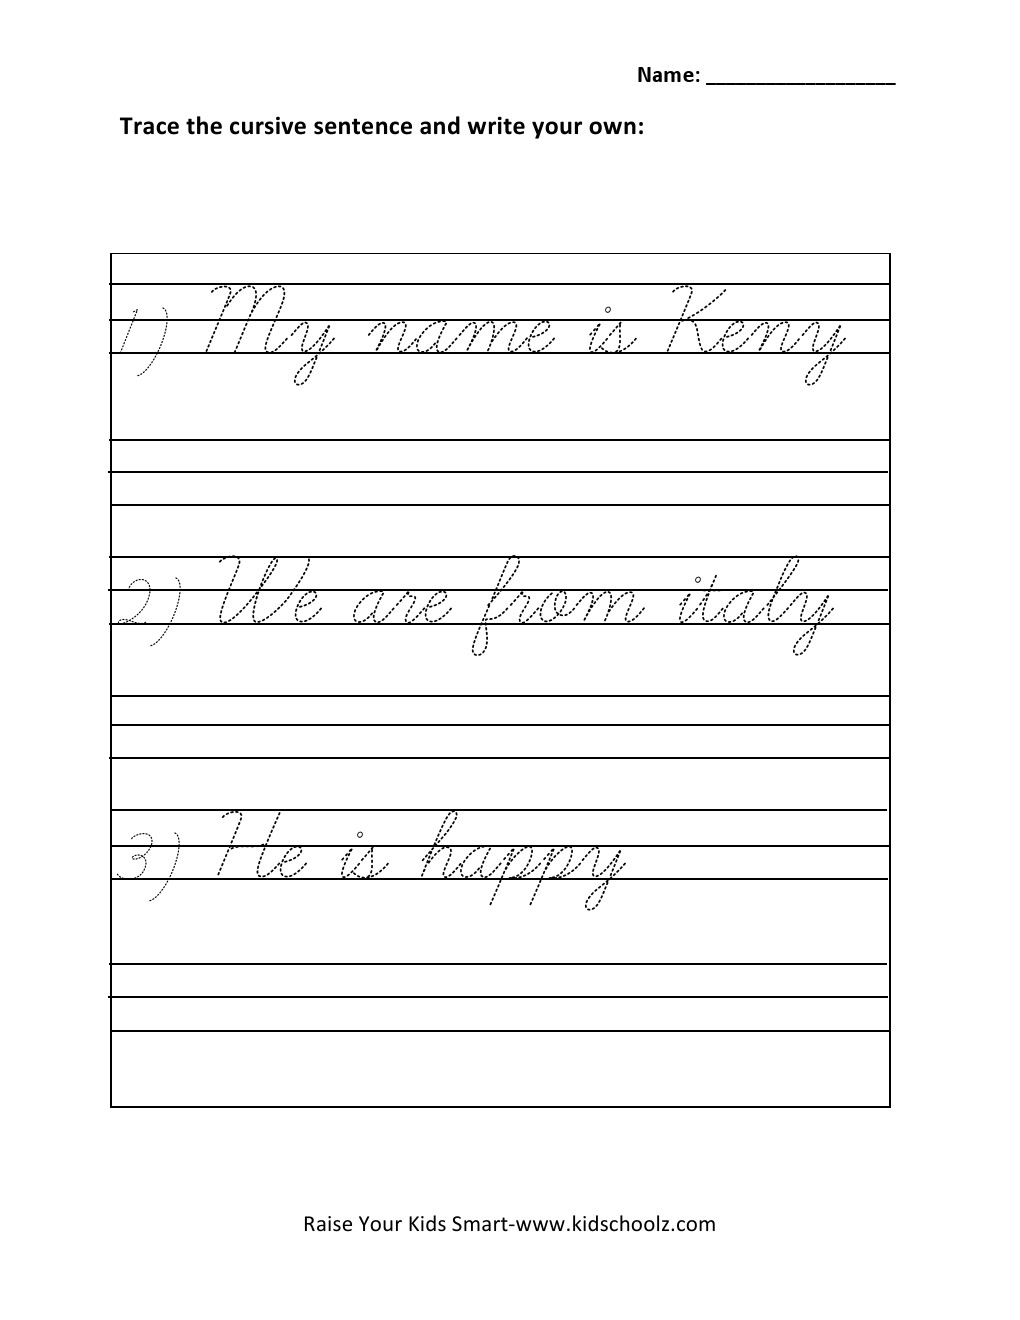 Cursive Writing Sentences Worksheets Free Library Sentence For